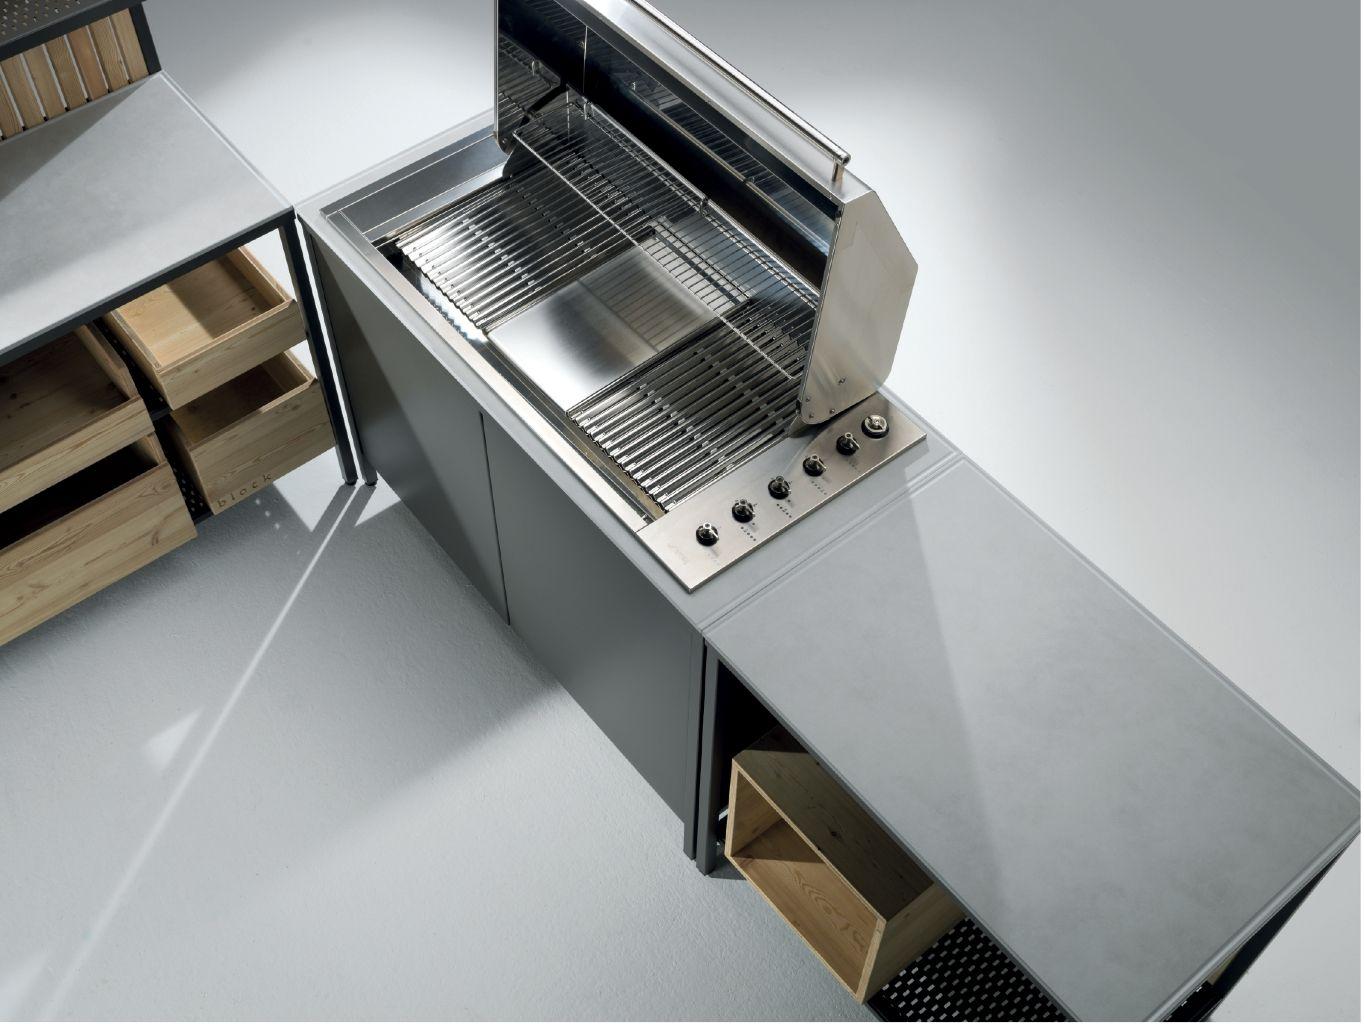 Outdoor Küche Edelstahl Schrank | Outdoorküche Planen ...